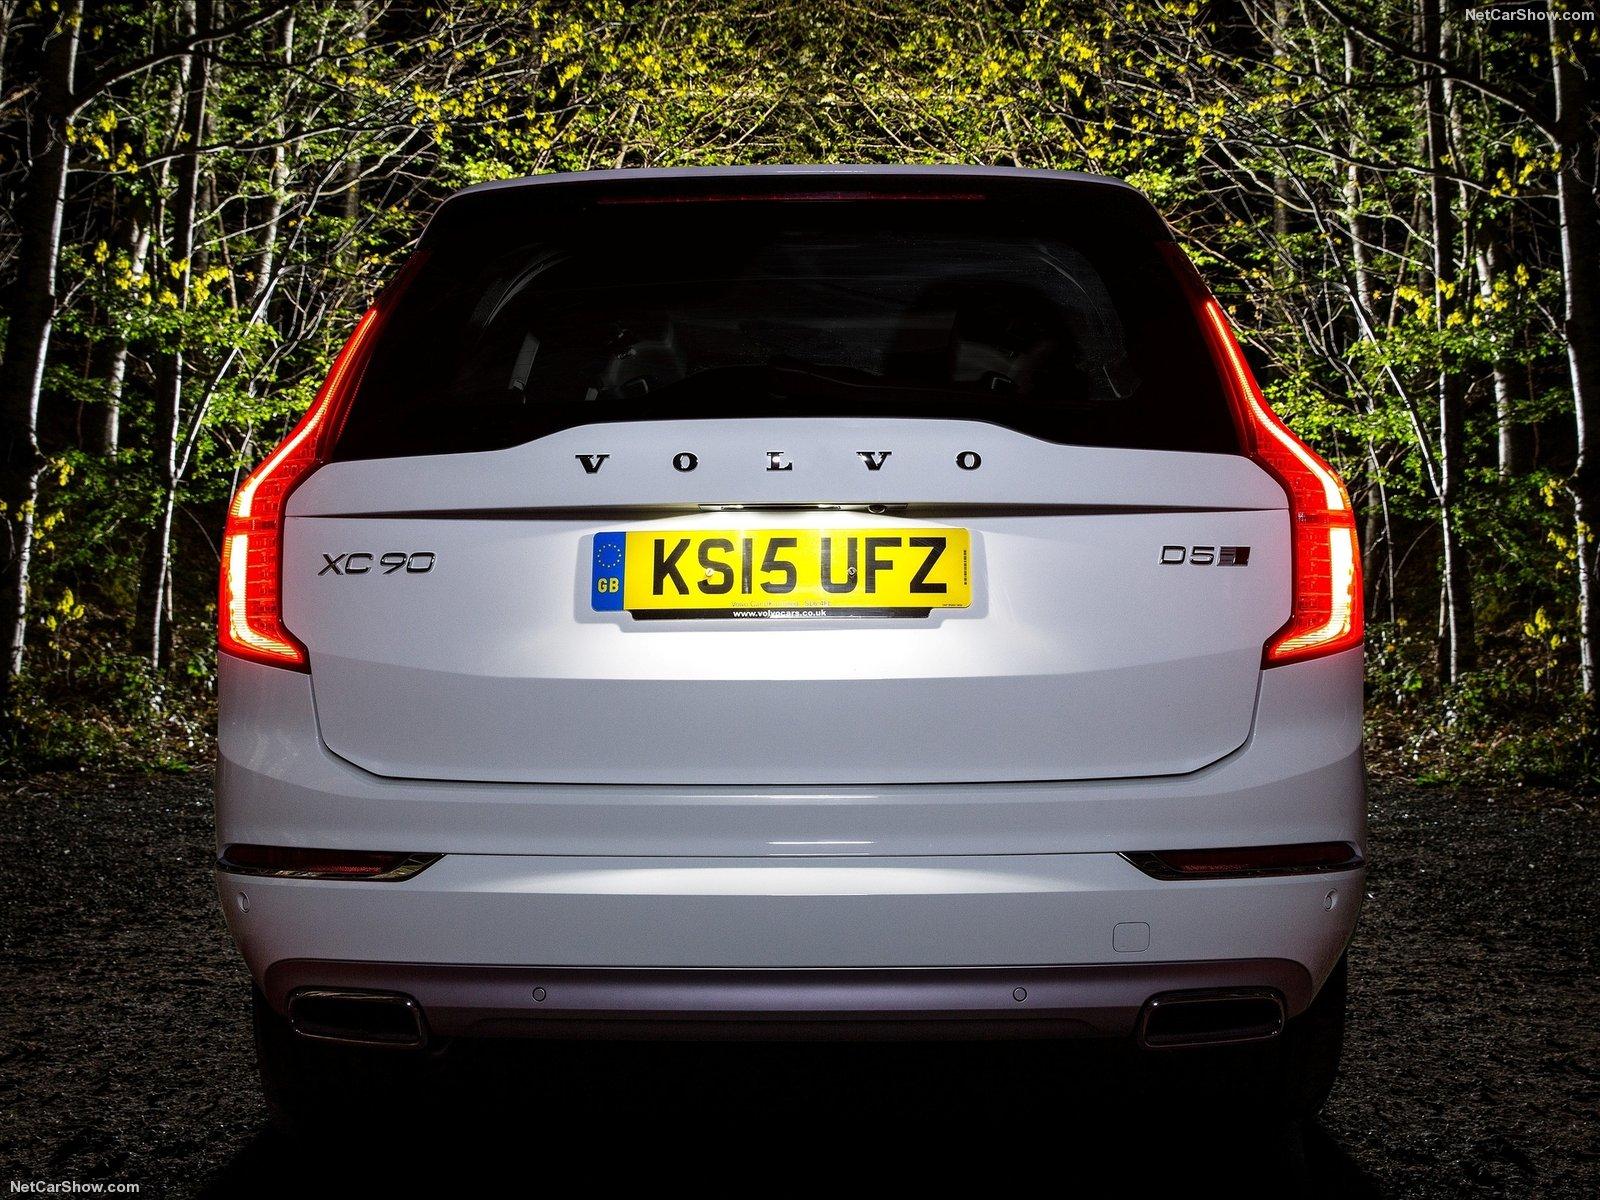 Volvo XC90 UK-Version 2015 Volvo-XC90_UK-Version-2015-1600-70